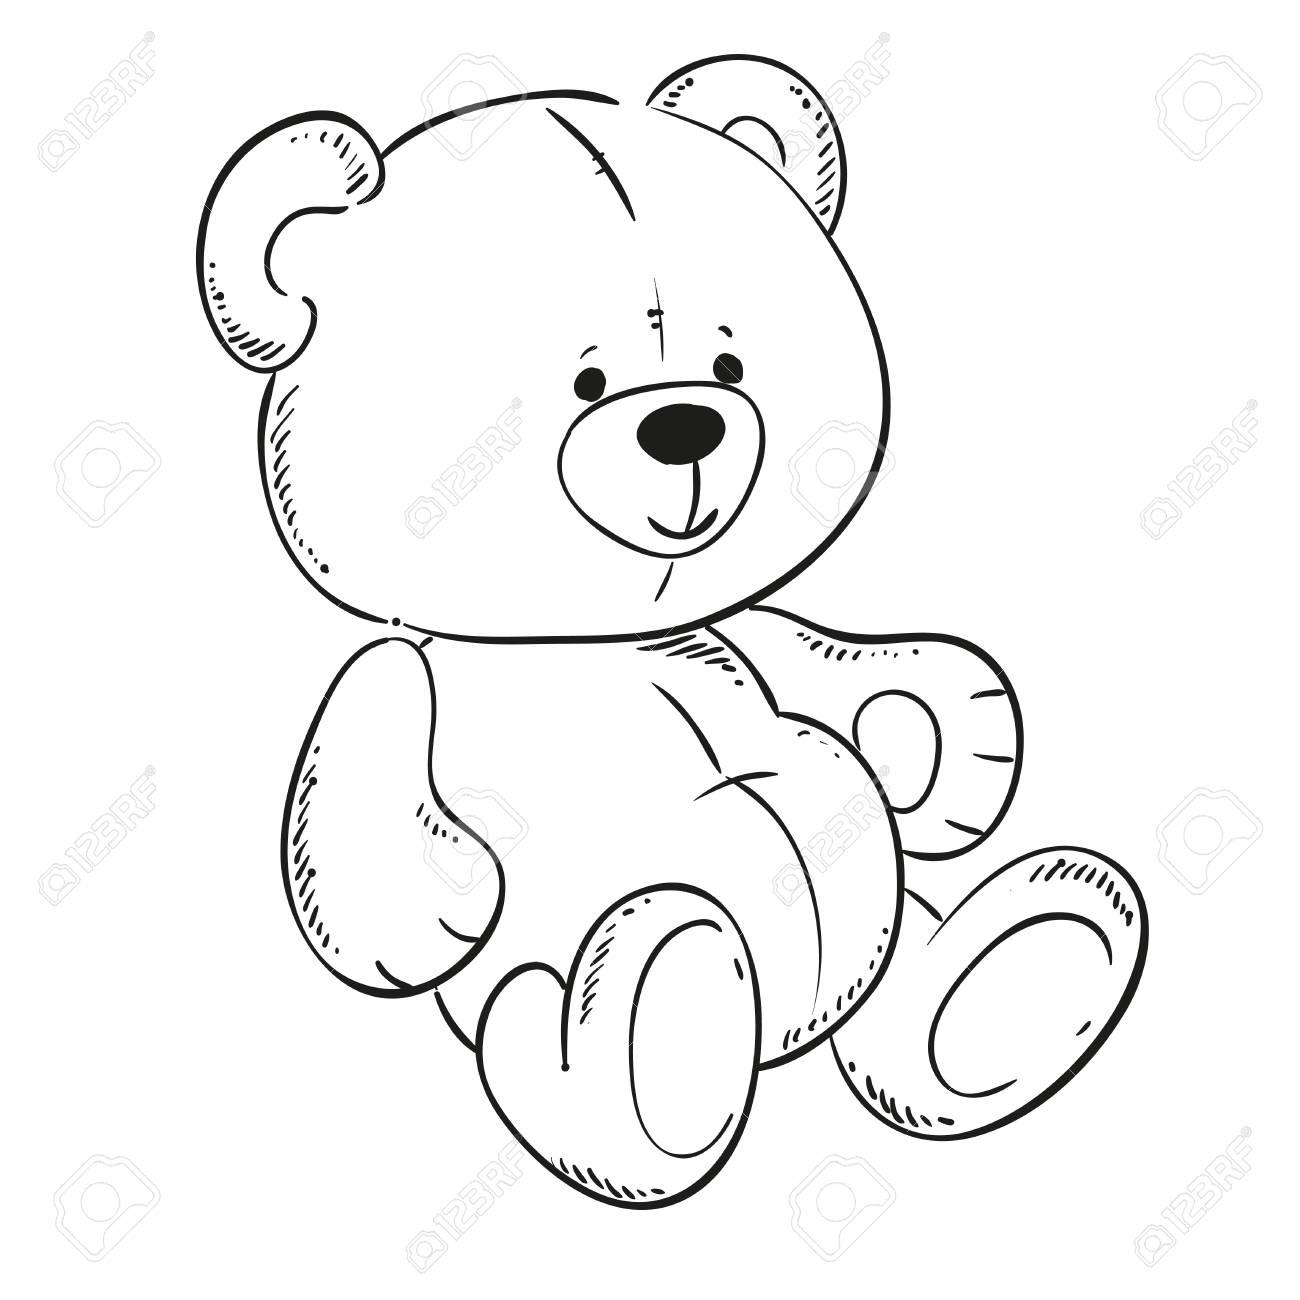 cute Teddy bear. Black outline for coloring book. Vector contour..